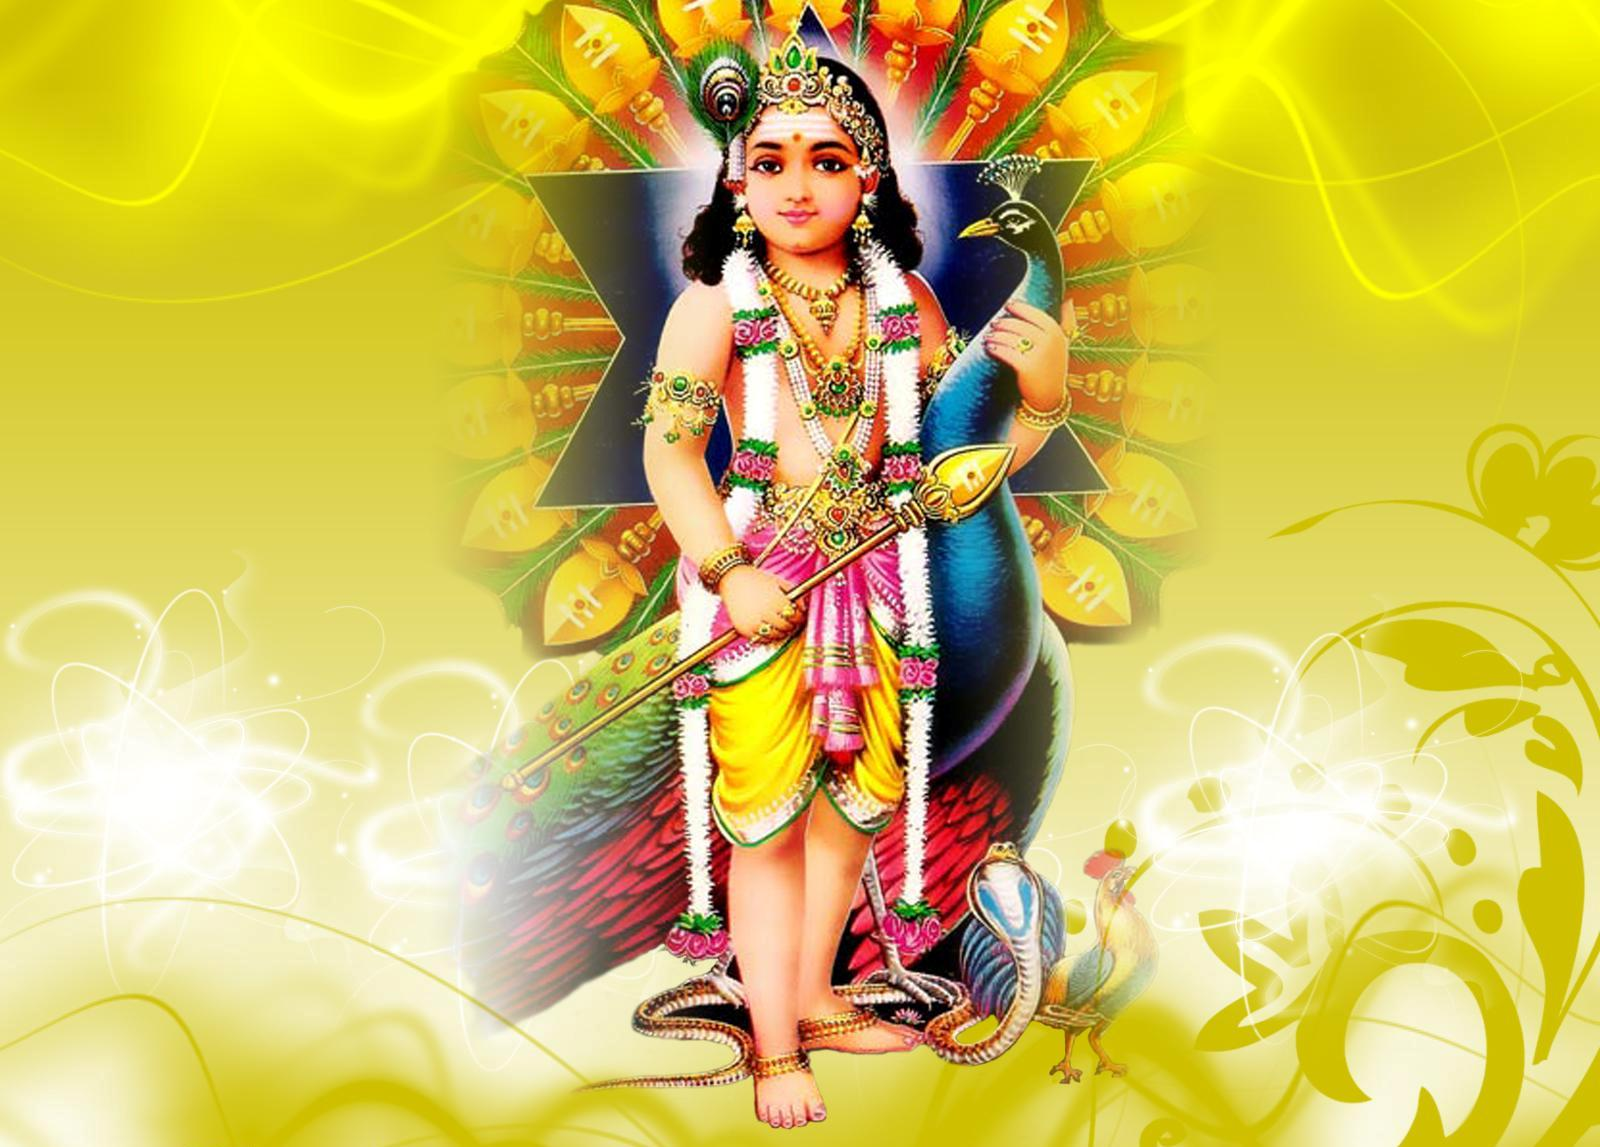 http://1.bp.blogspot.com/_WOWQJUlRtKQ/TQyXKnJ1XCI/AAAAAAAAA5M/NORKxa8kyxk/s1600/god_murugan_images.jpg